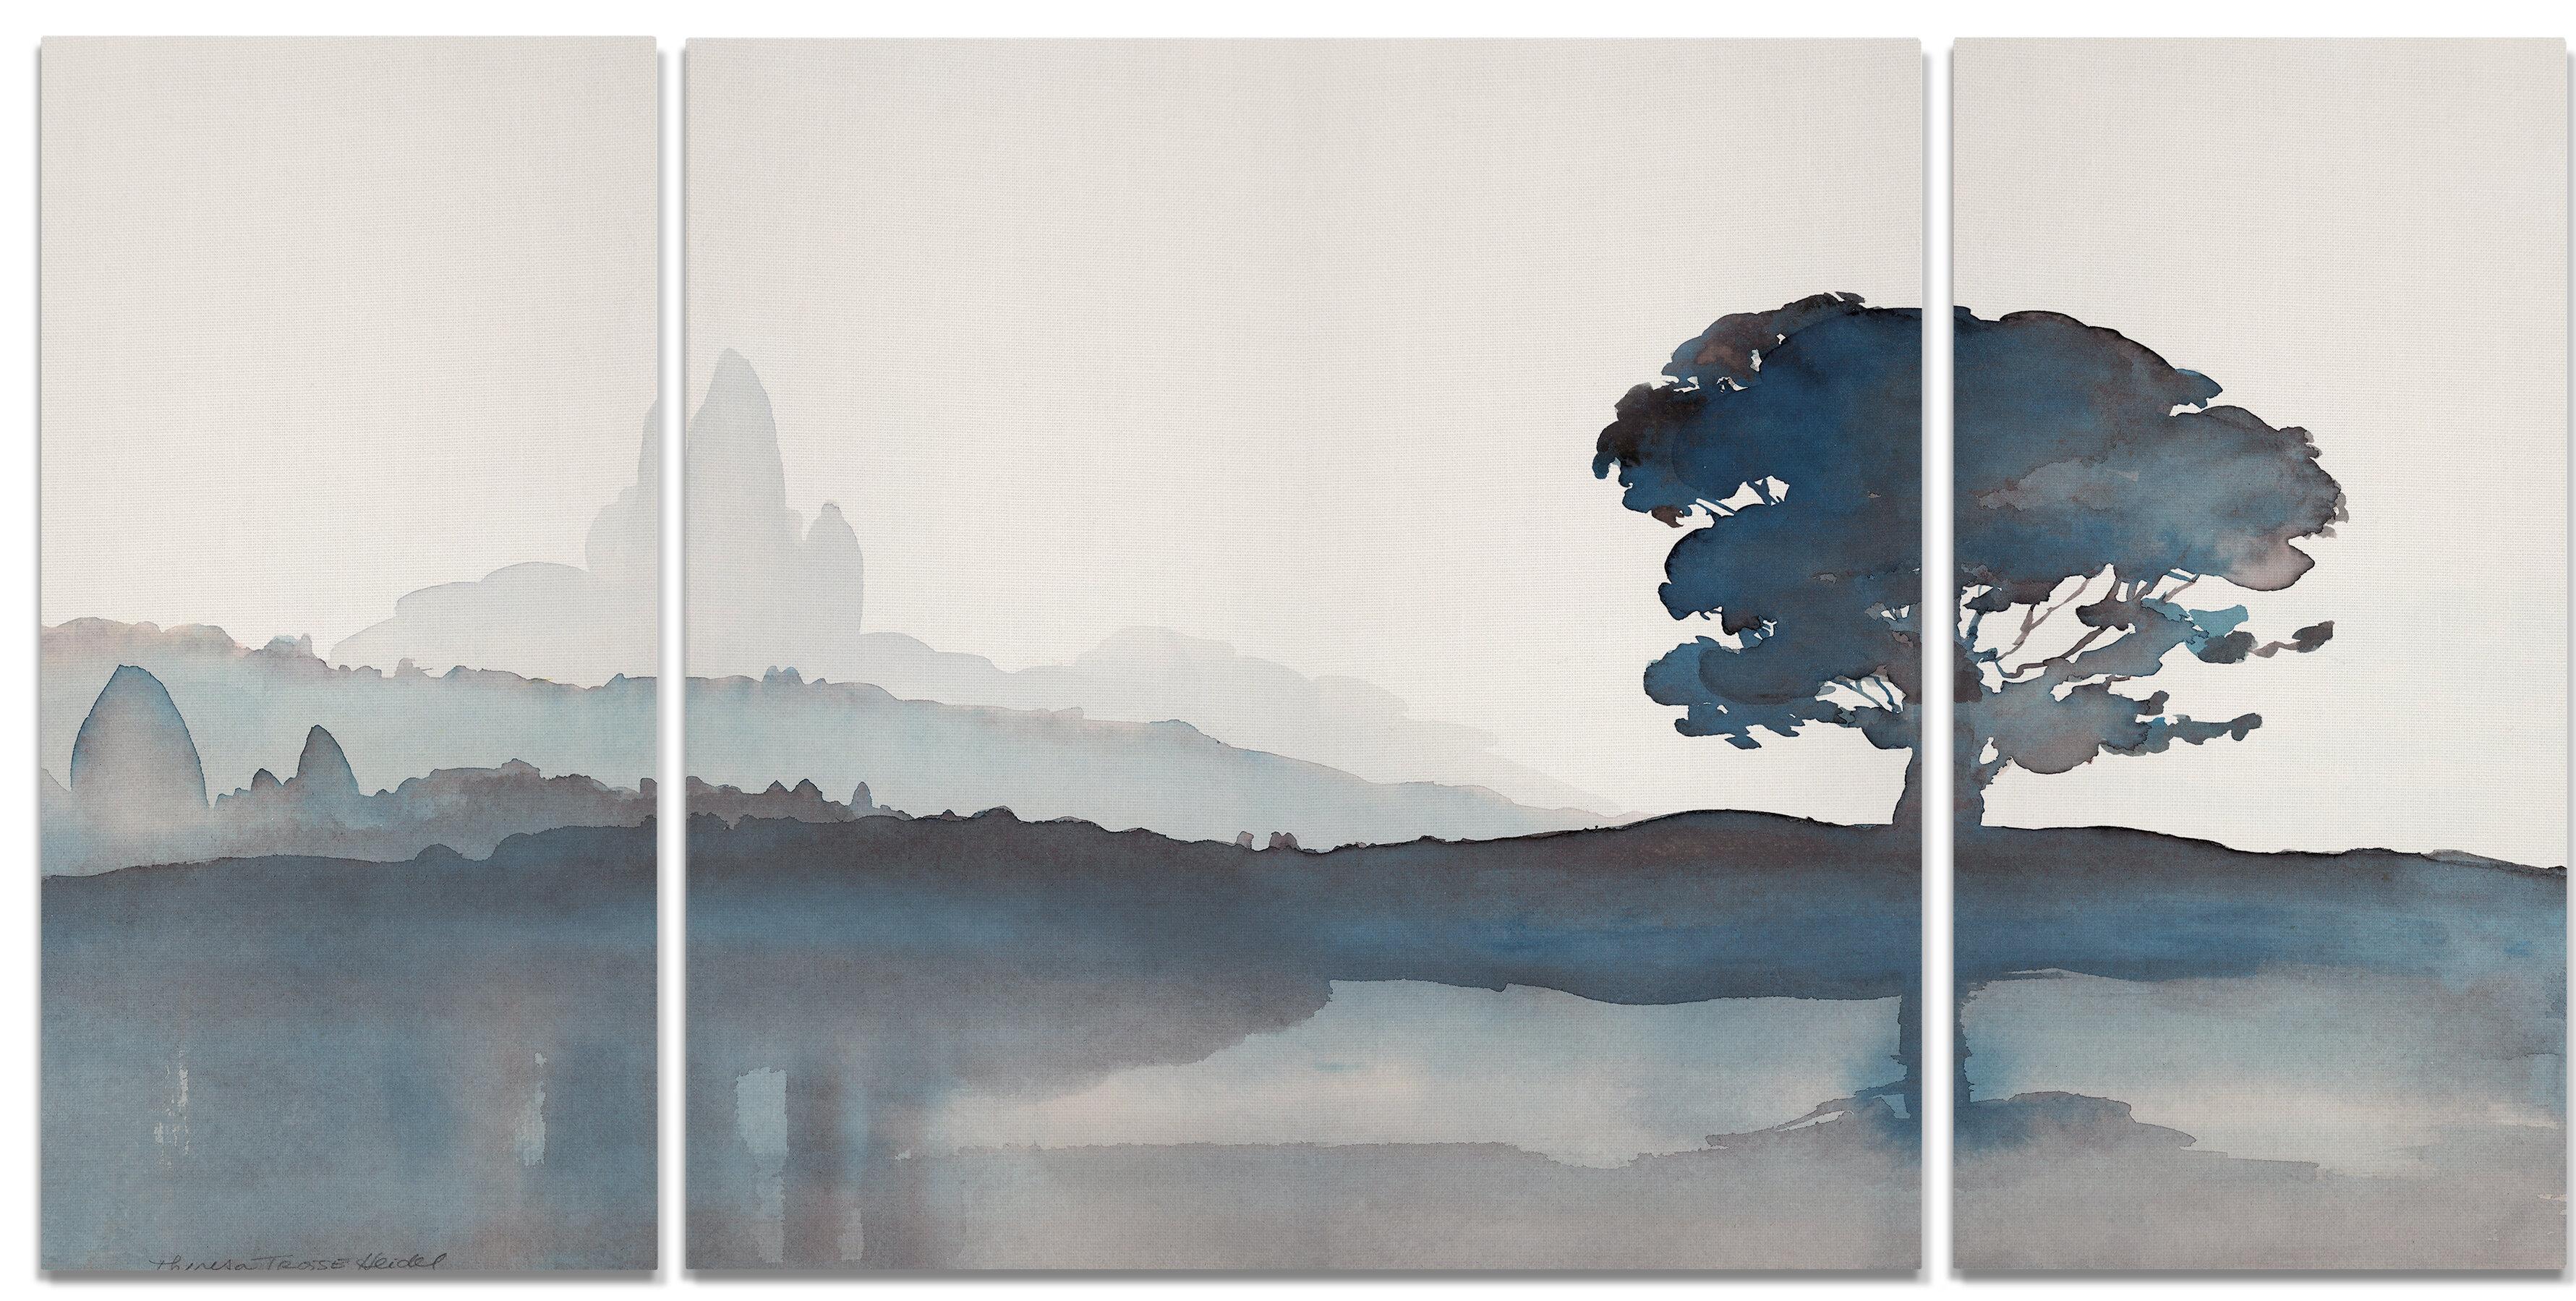 Winston Porter A Premium Serene Silhouette Ii Graphic Art Print Multi Piece Image On Wrapped Canvas Wayfair